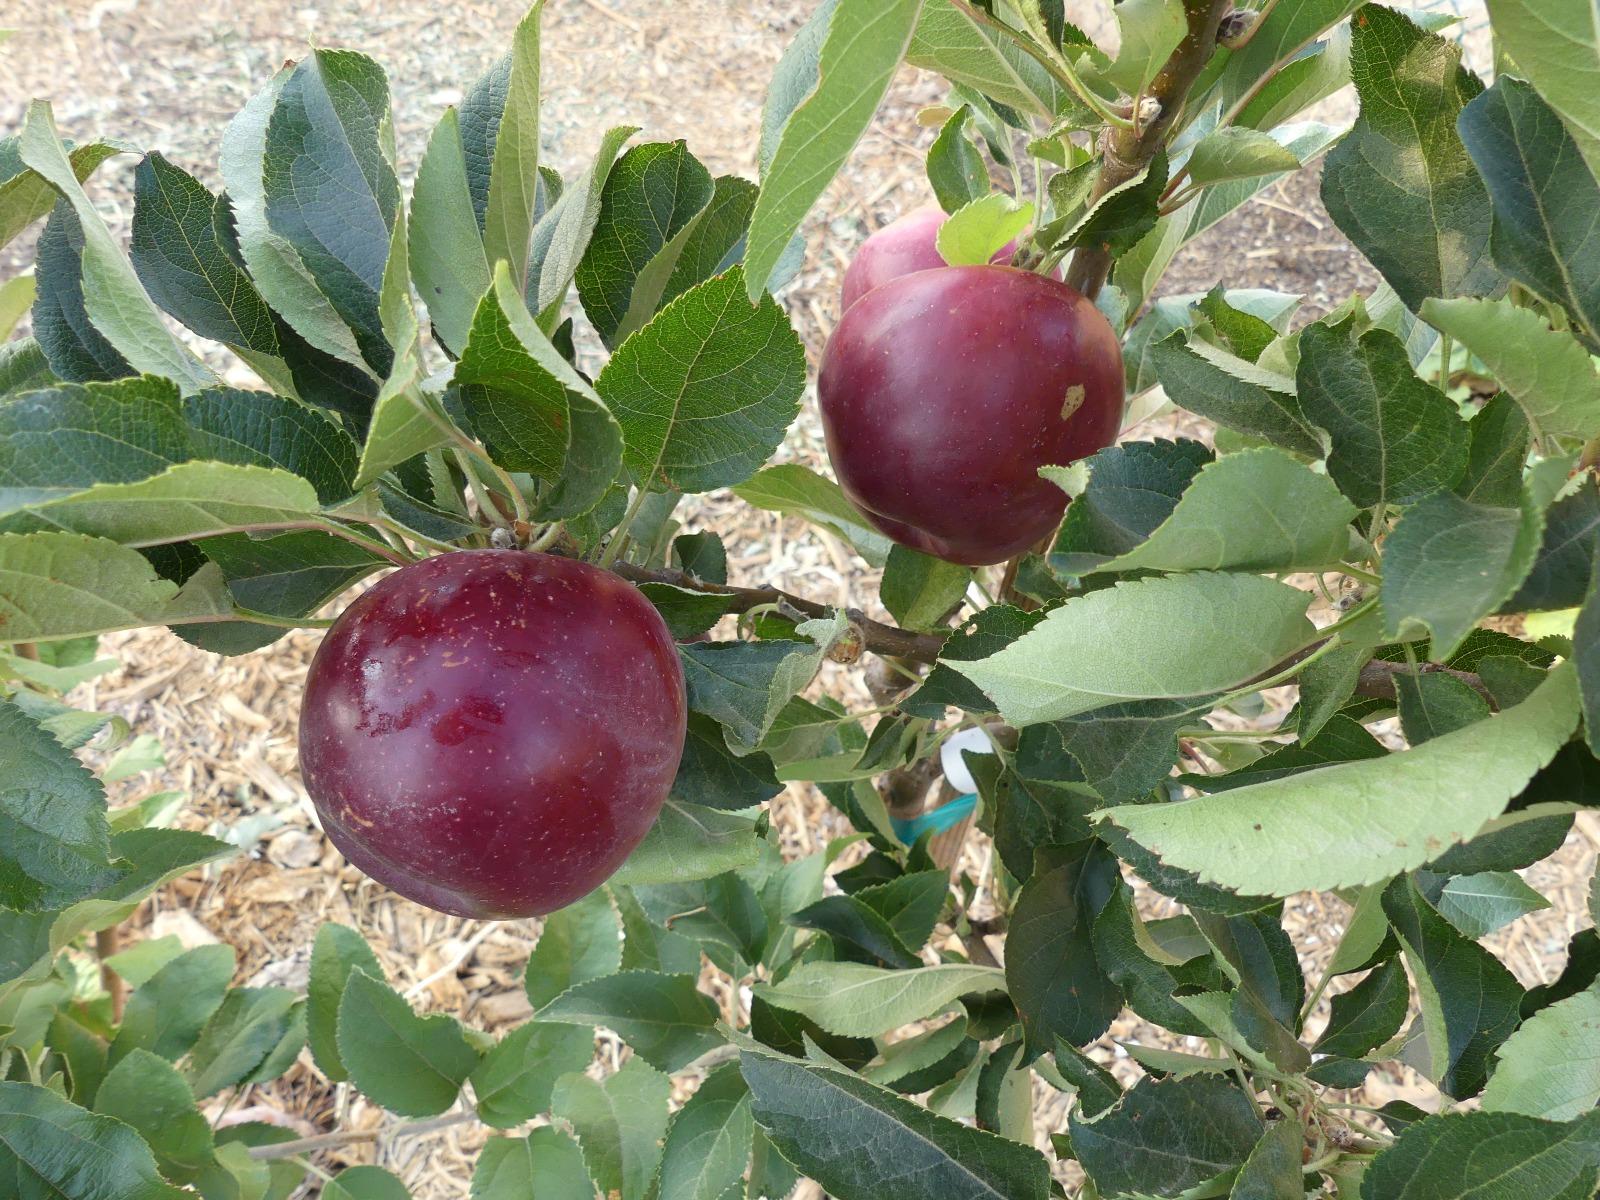 Arkansas Black apples in tree